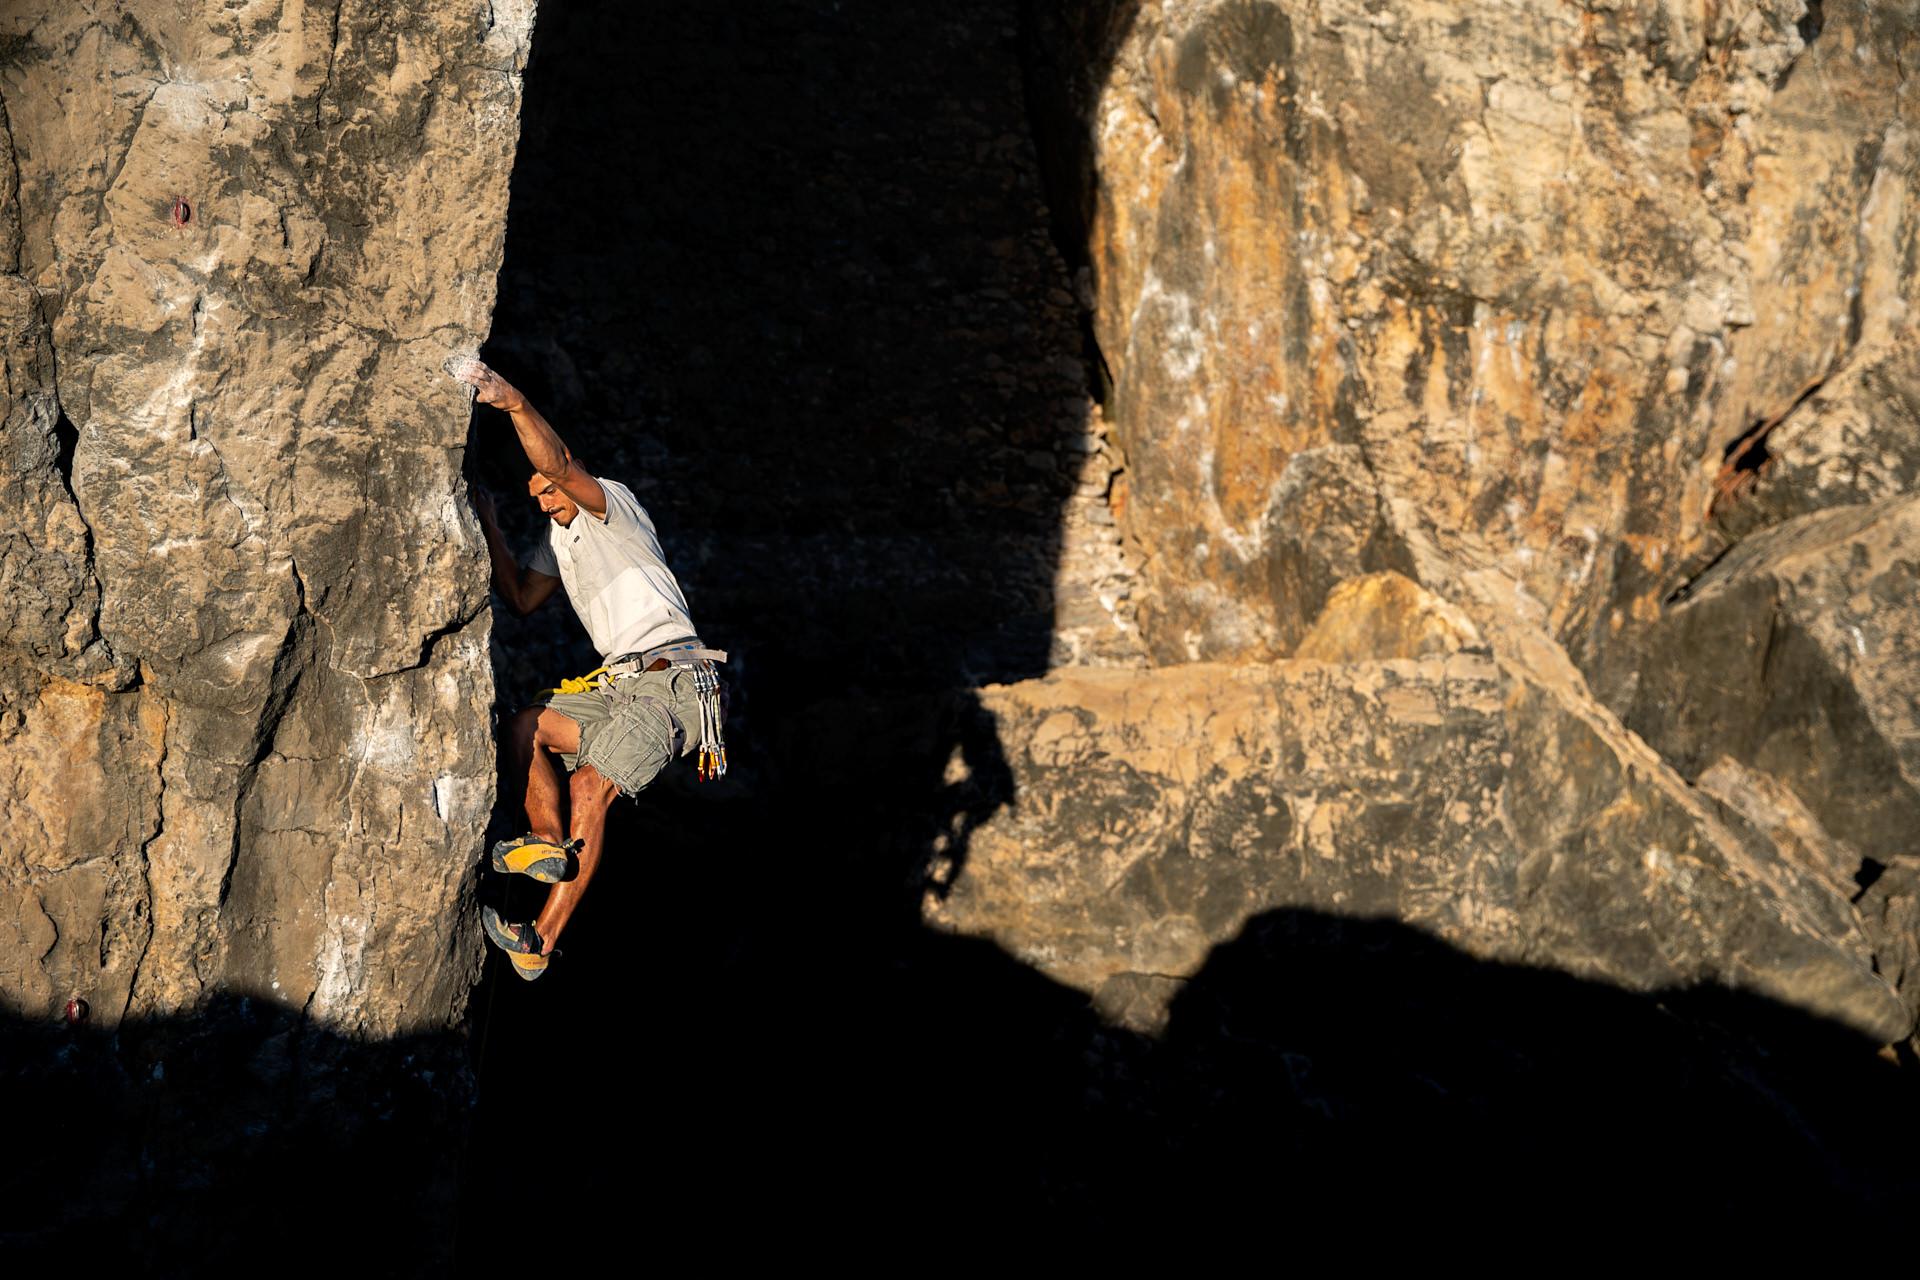 Lisbon Climbing Guide - Ricardo Costa climbing Pinóquio (7a+) in Guia ©Martim Vidigal